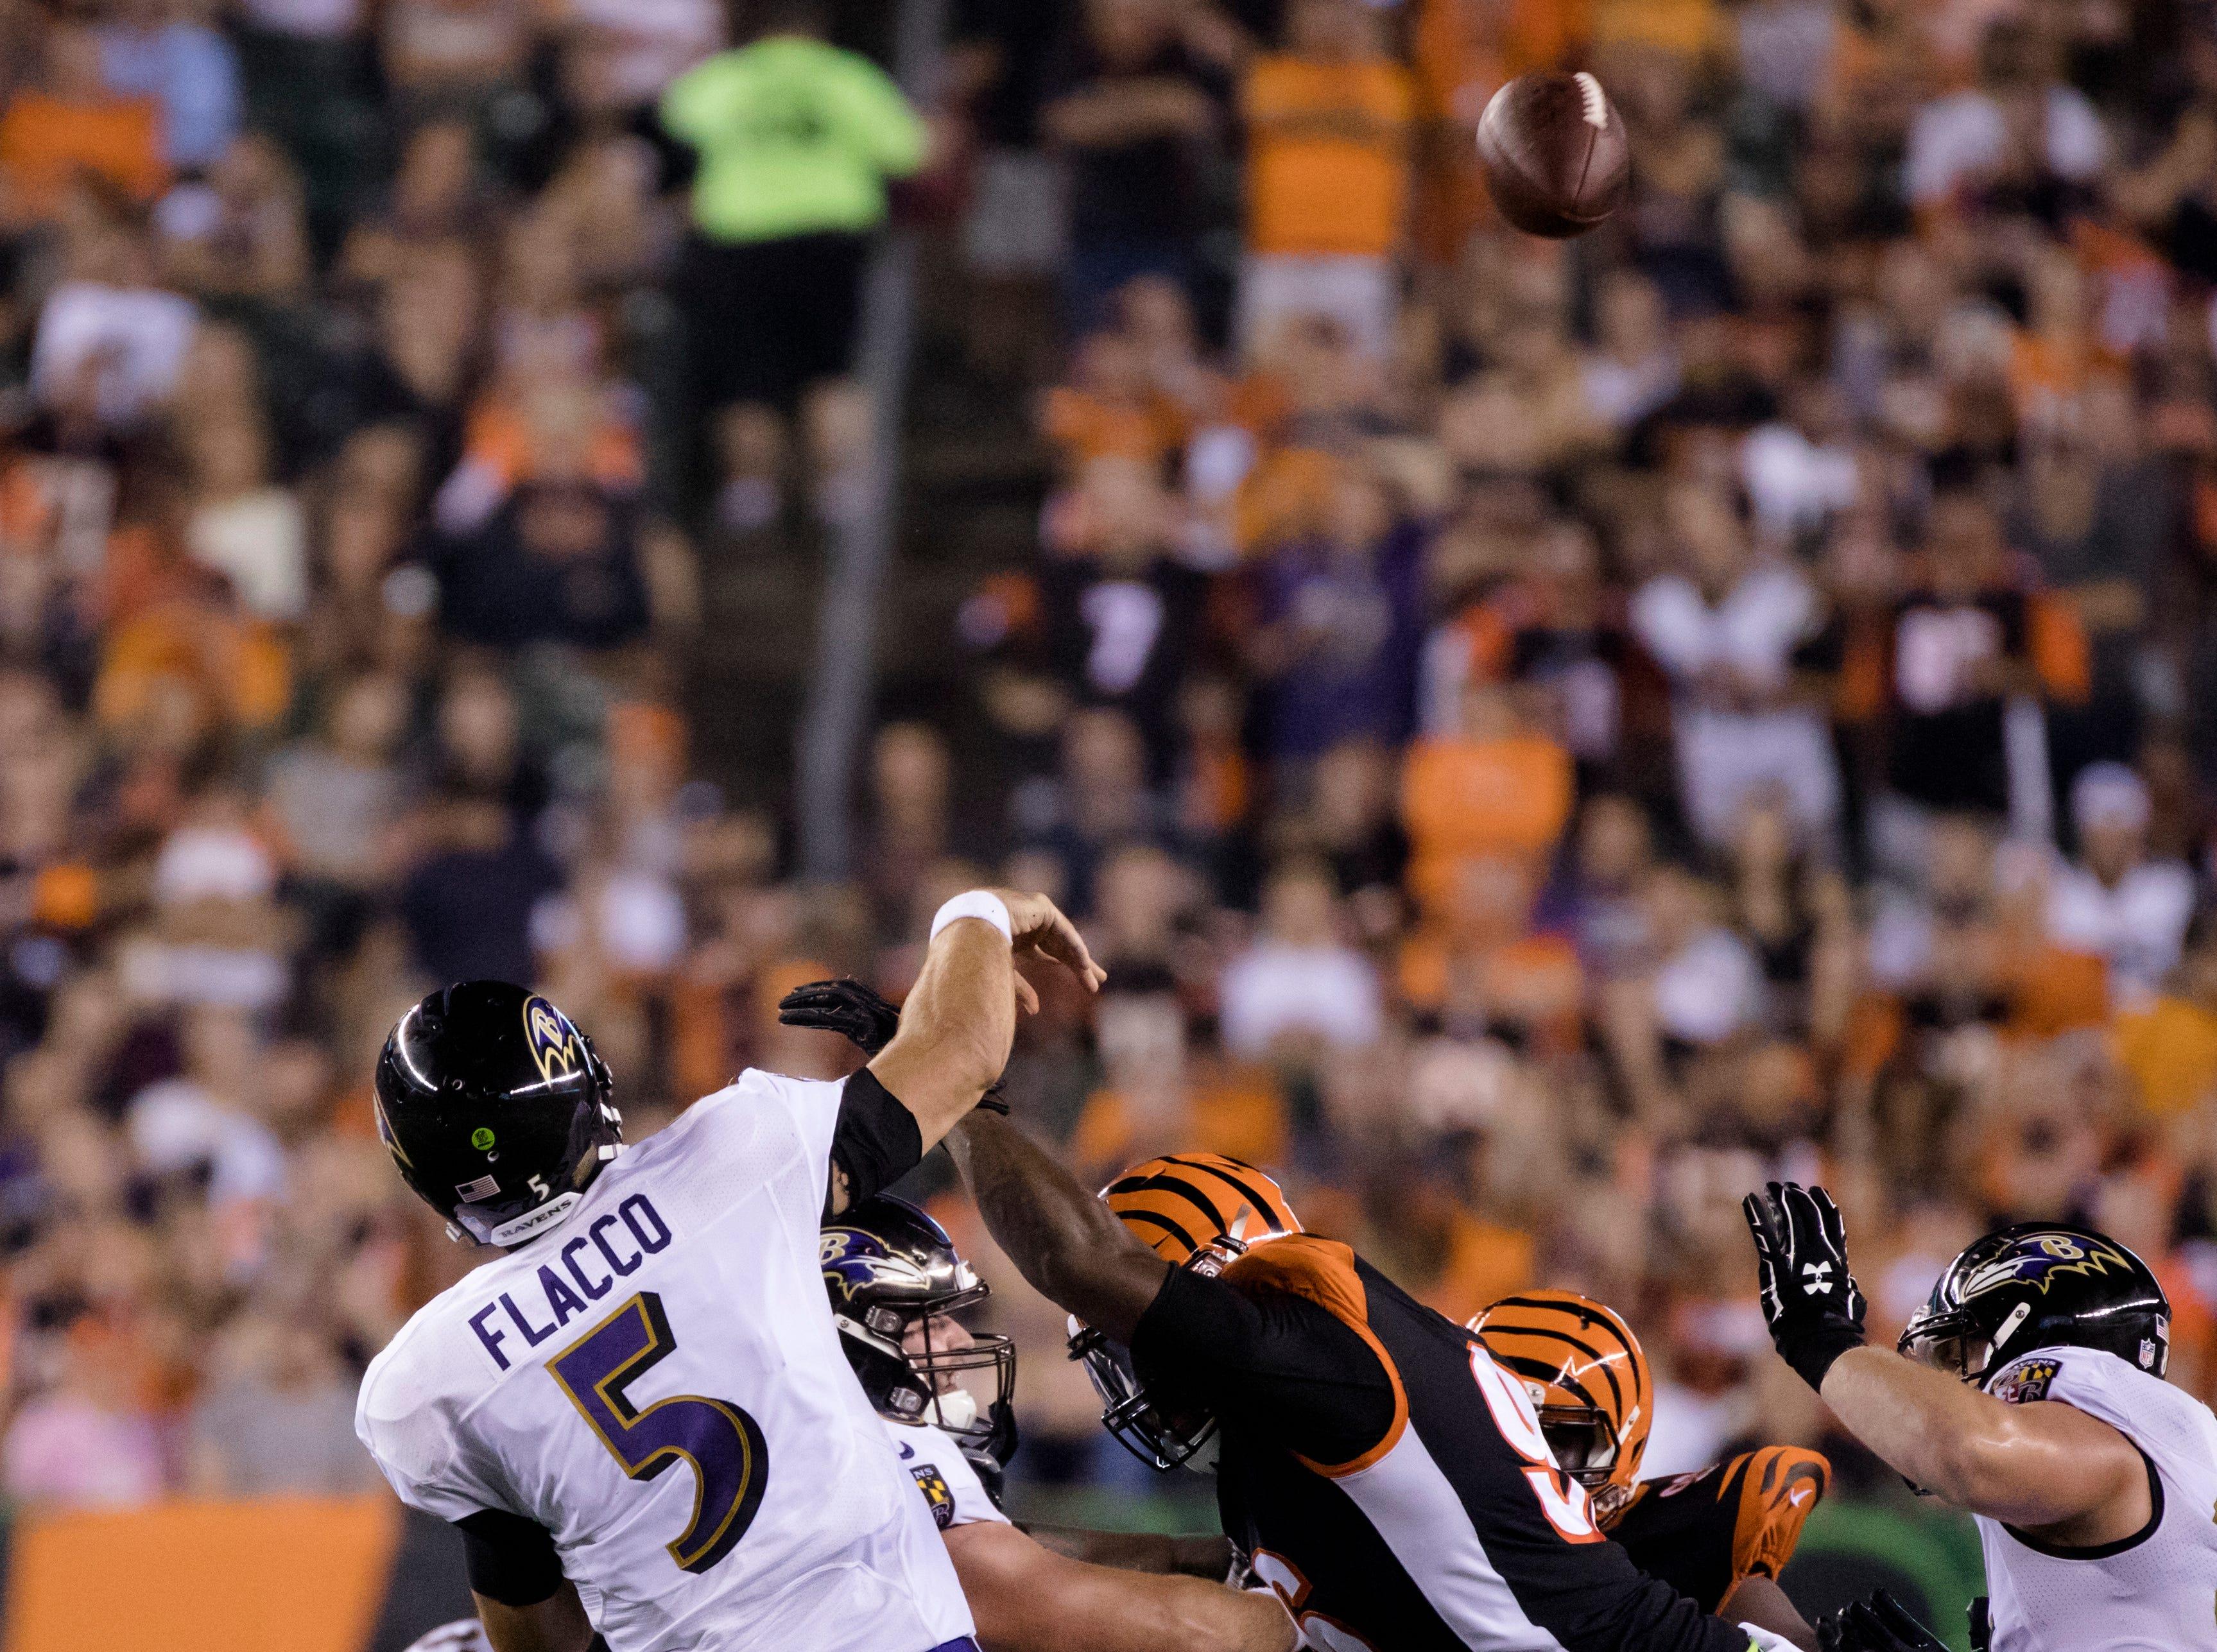 Cincinnati Bengals defensive end Carlos Dunlap (96) knocks the hand of Baltimore Ravens quarterback Joe Flacco (5) causing an interception during the Week 2 NFL game between the Cincinnati Bengals and the Baltimore Ravens, Thursday, Sept. 13, 2018, at Paul Brown Stadium in Cincinnati.